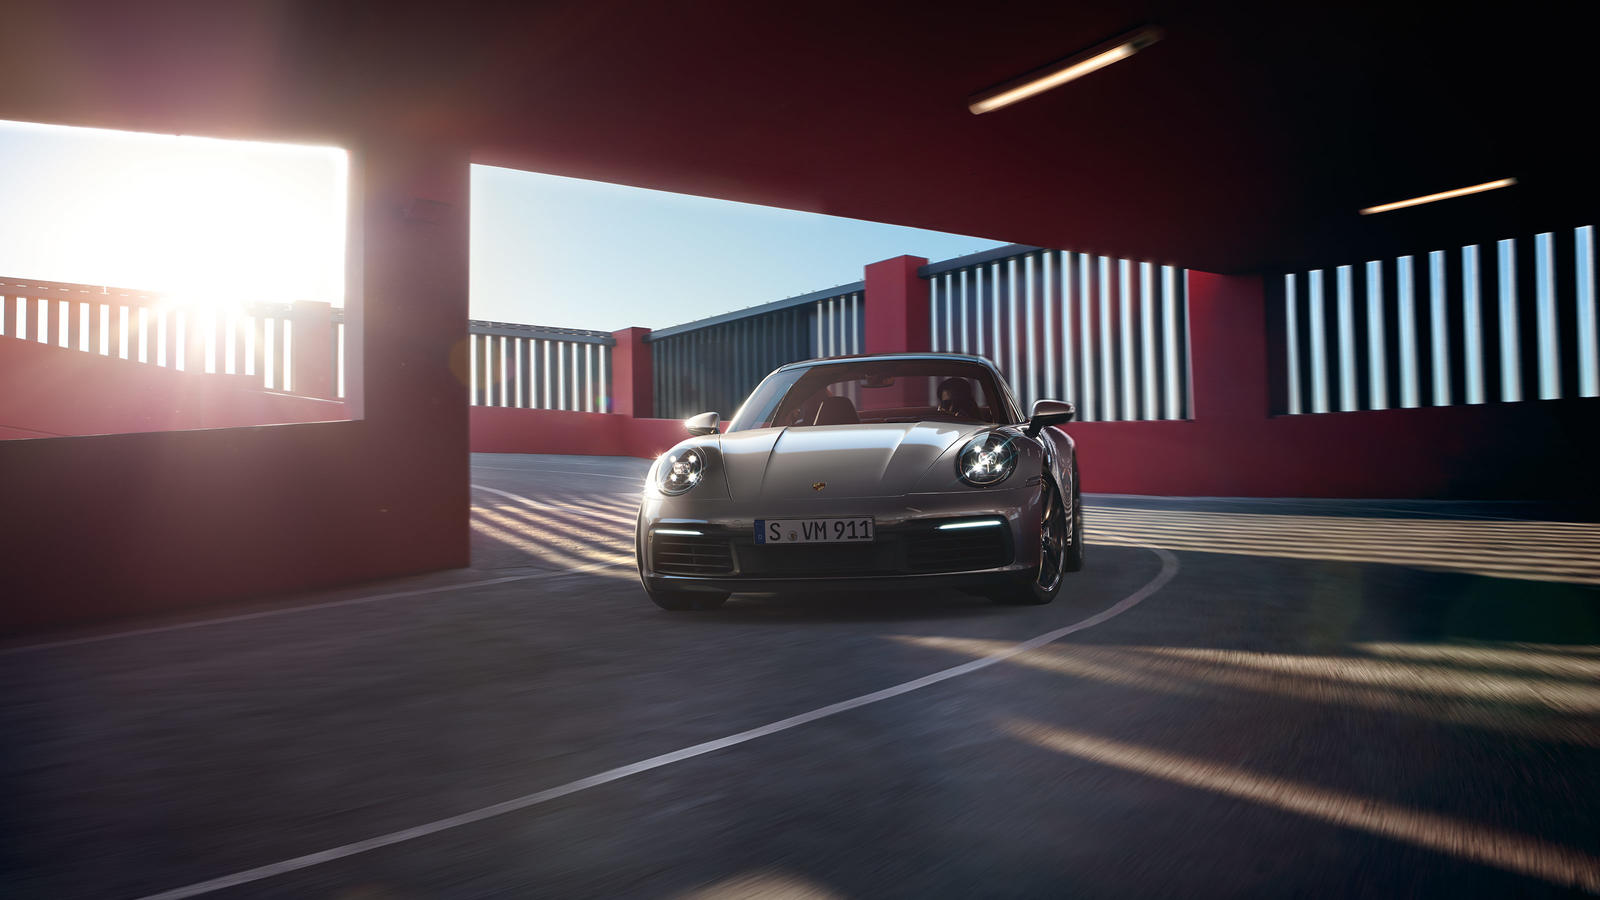 Porsche - 911 Carrera S Cabriolet    - Timeless Machine